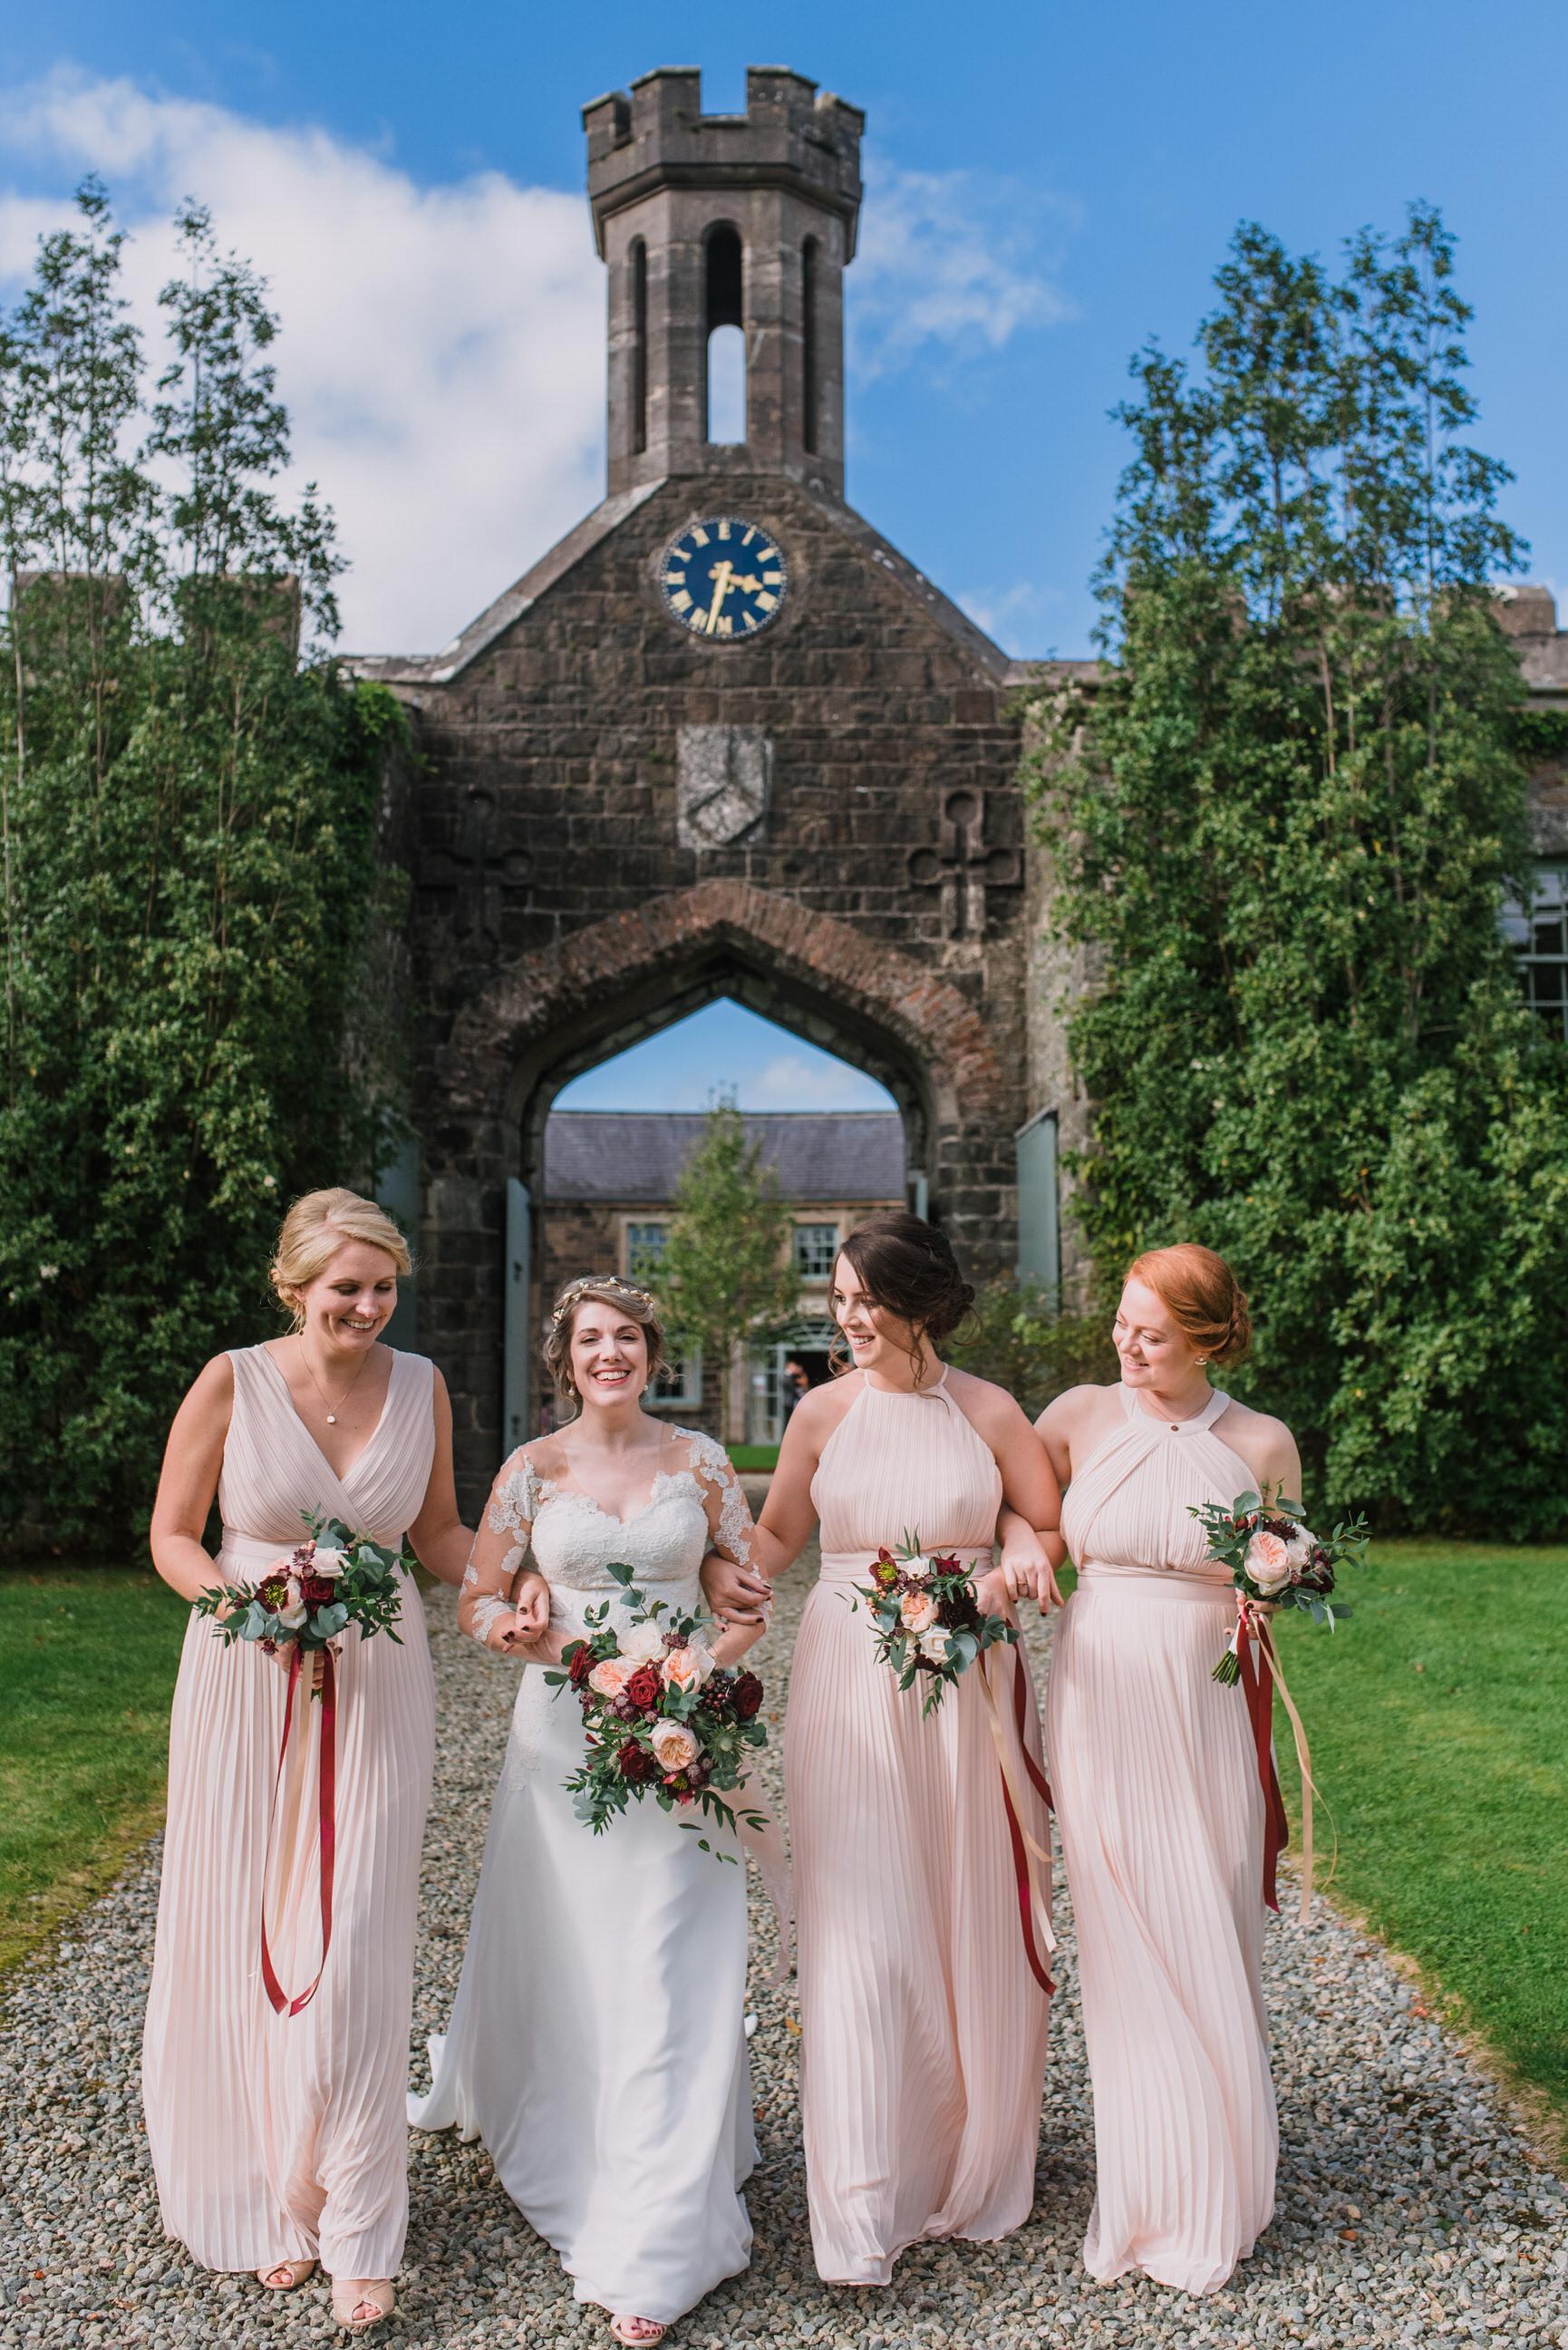 lissanoure castle wedding, northern ireland wedding photographer, romantic northern irish wedding venue, castle wedding ireland, natural wedding photography ni (79).jpg